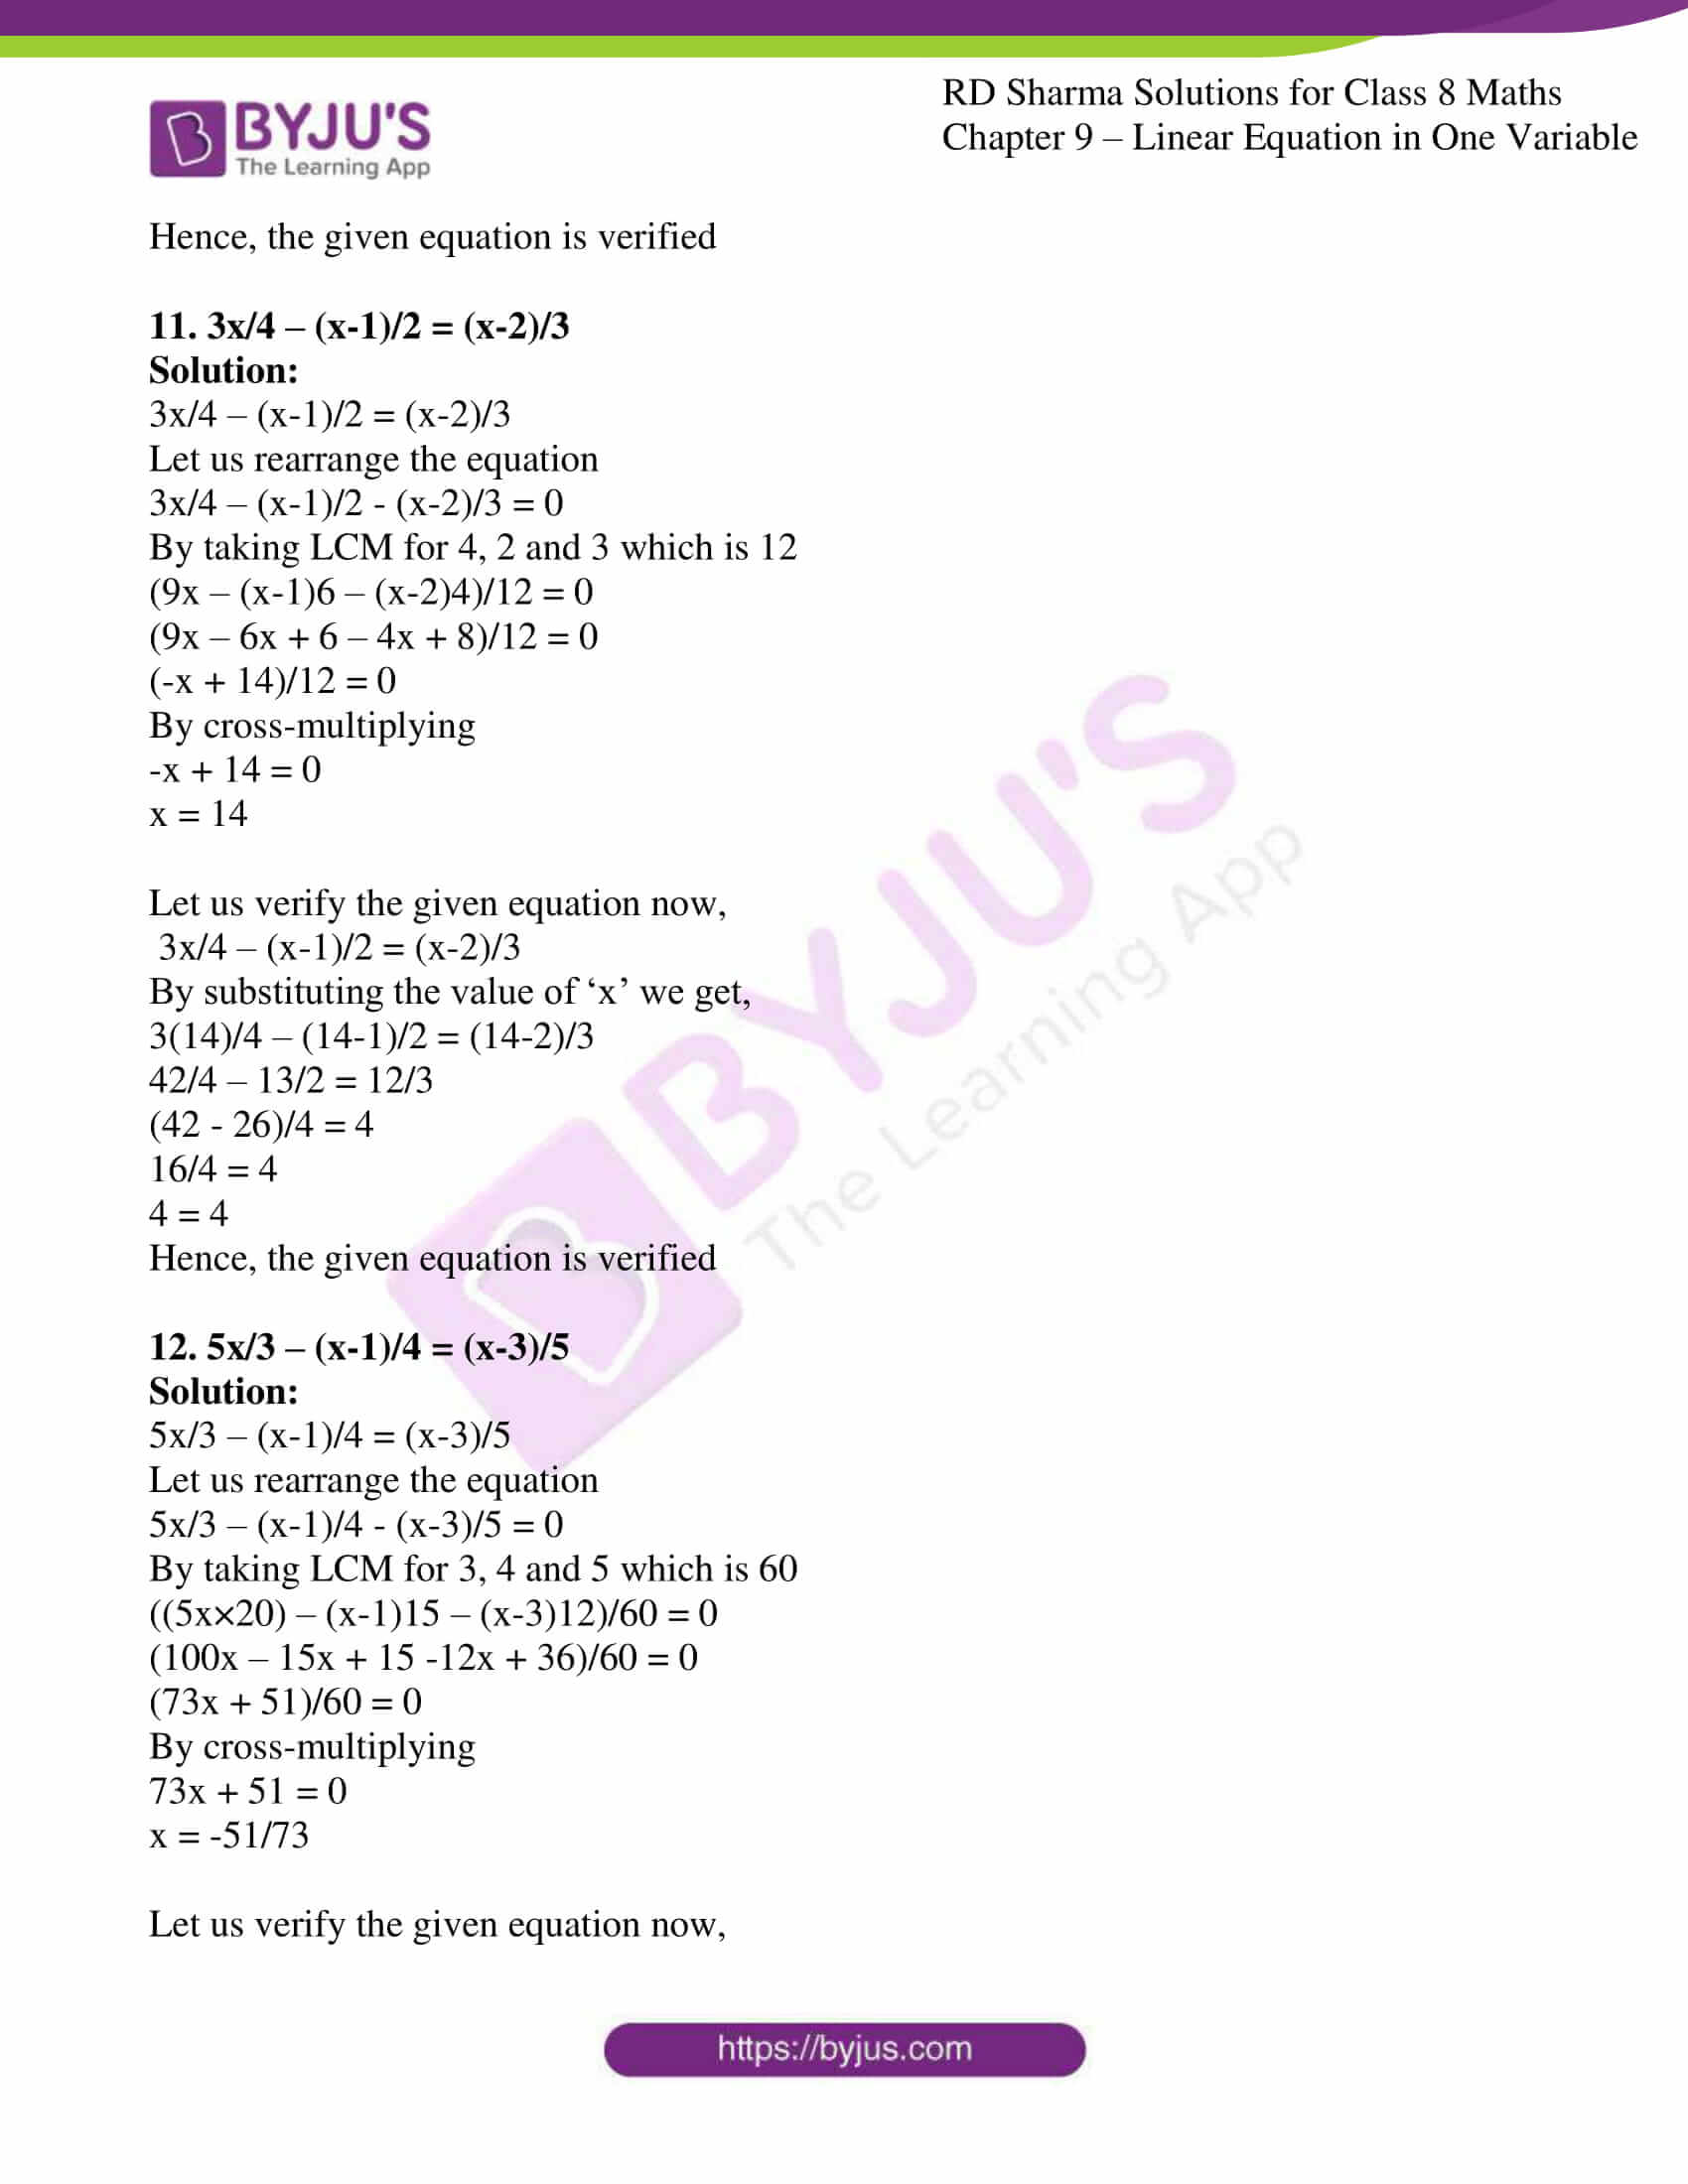 rd sharma class 8 maths chapter 9 exercise 2 07